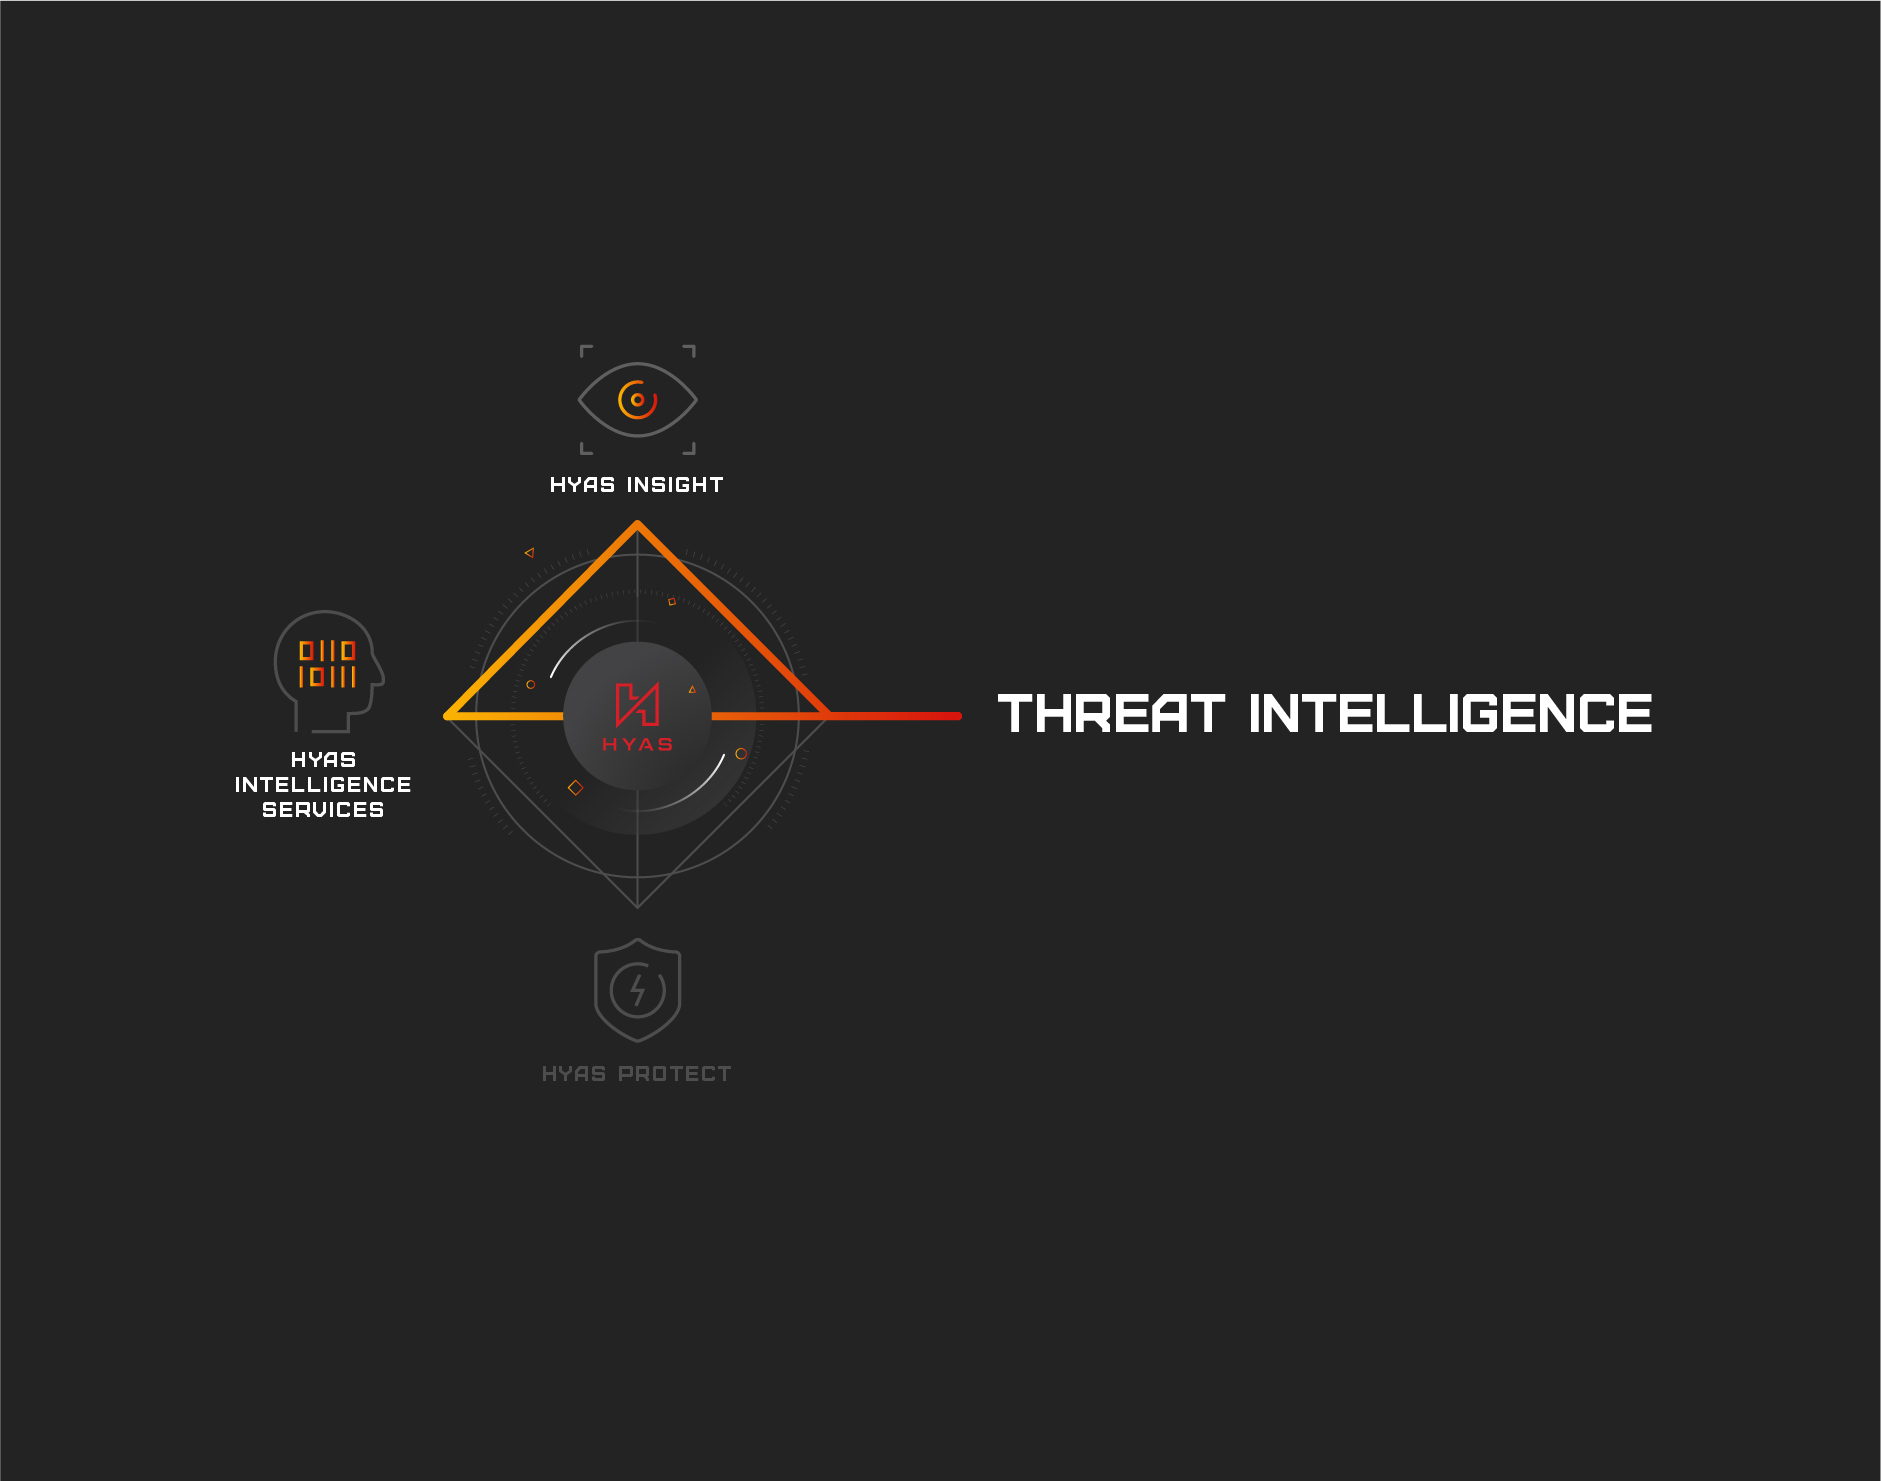 threat intelligence@4x-100